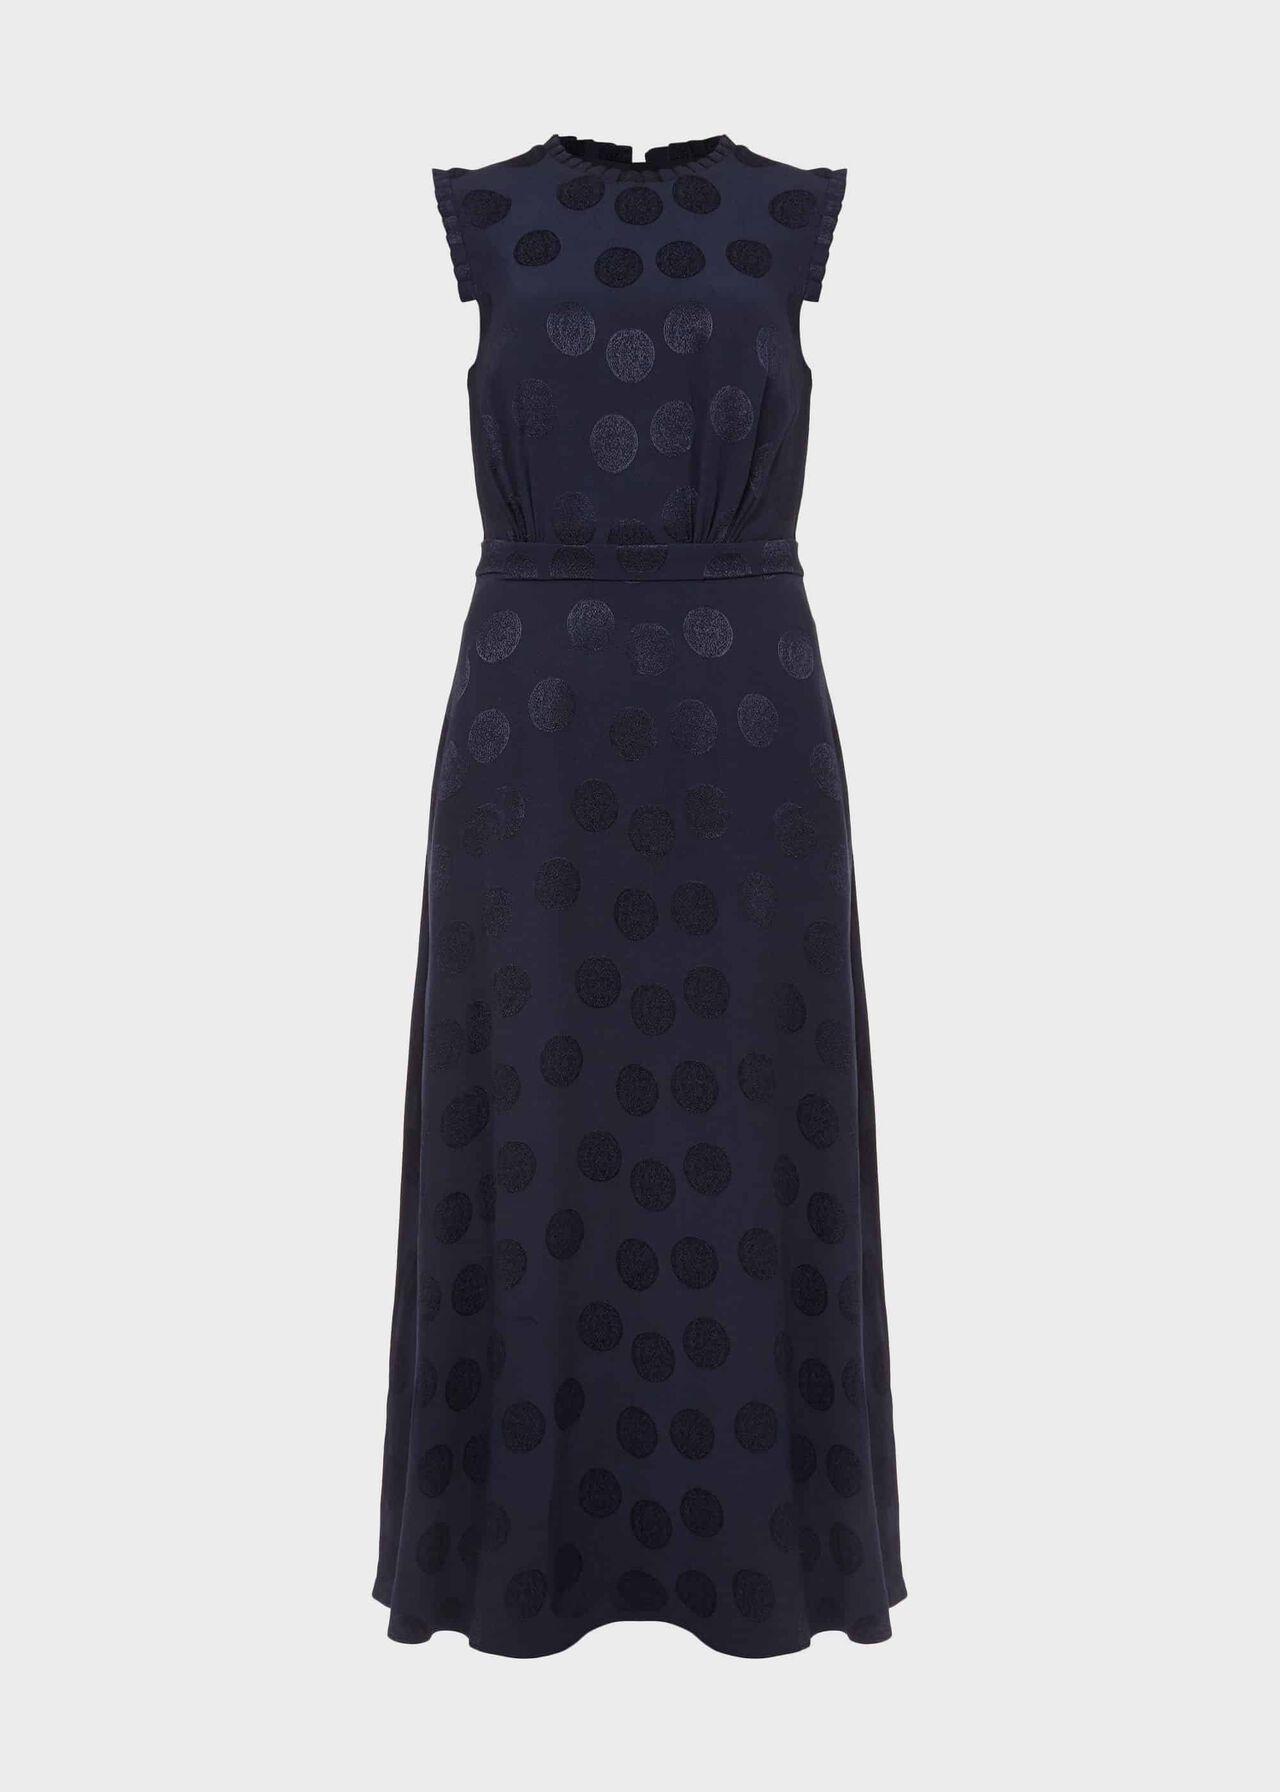 Ashley Jacquard Spot Dress Midnight